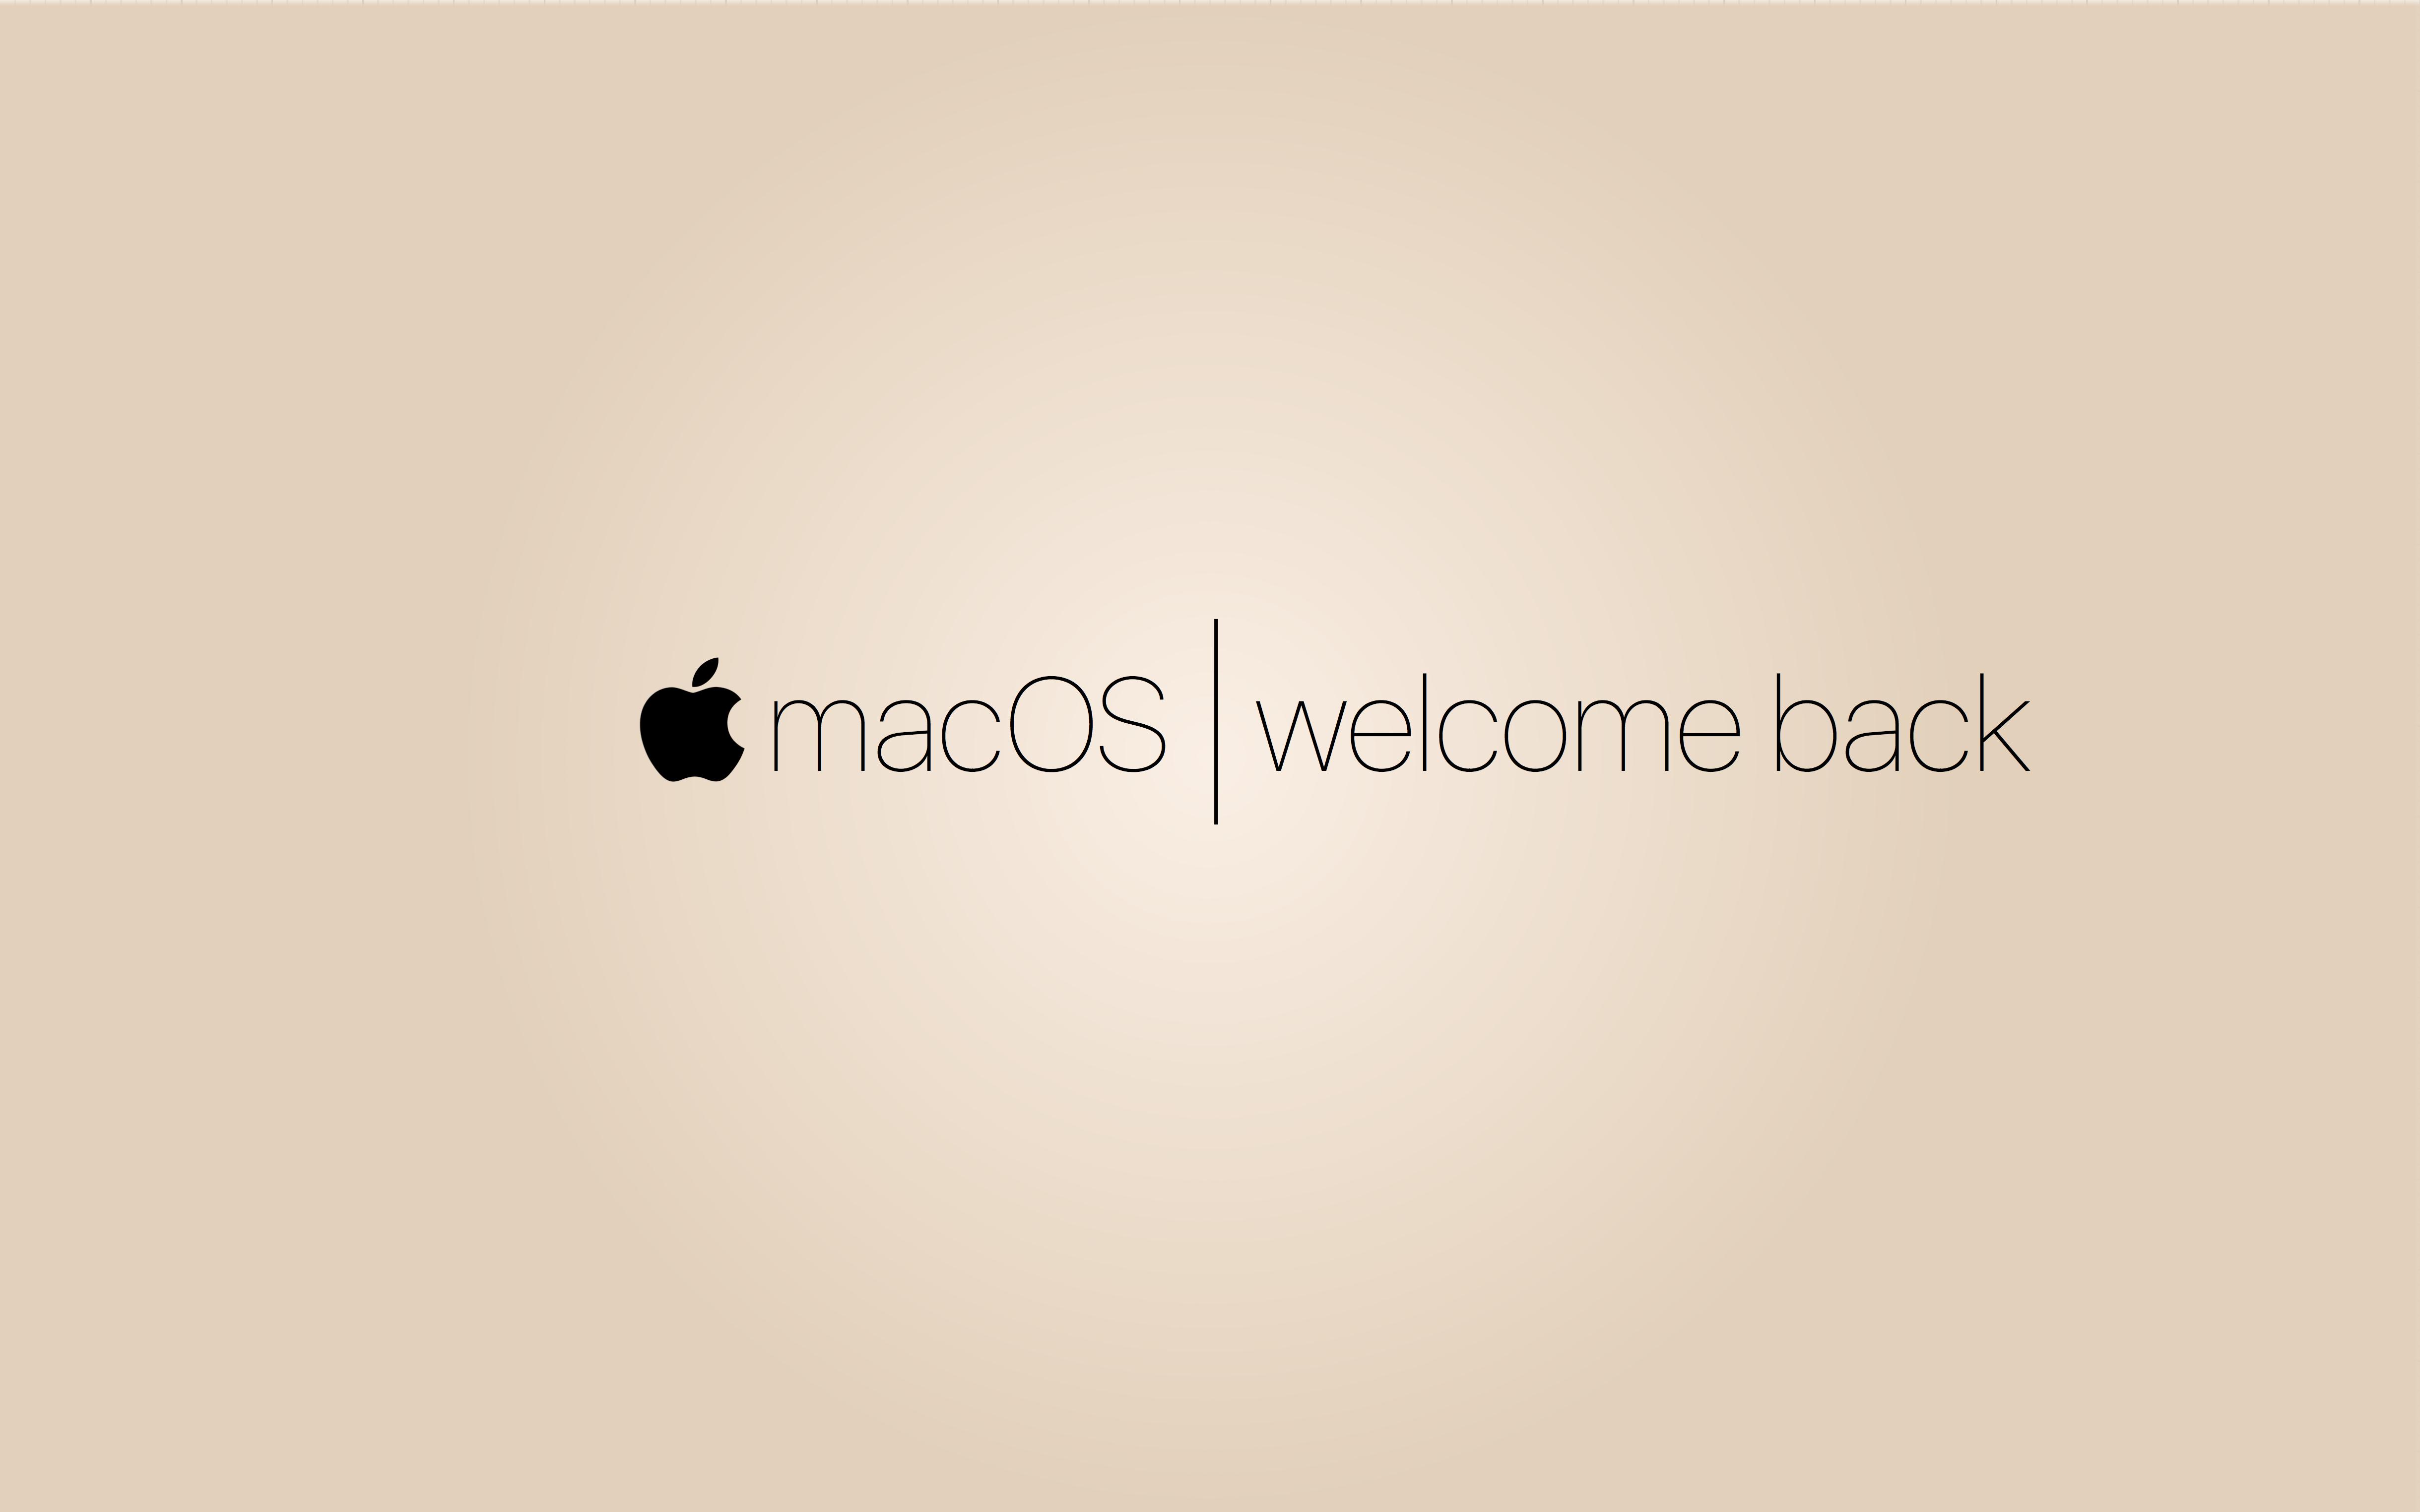 macOS | Welcome back - g.jpg